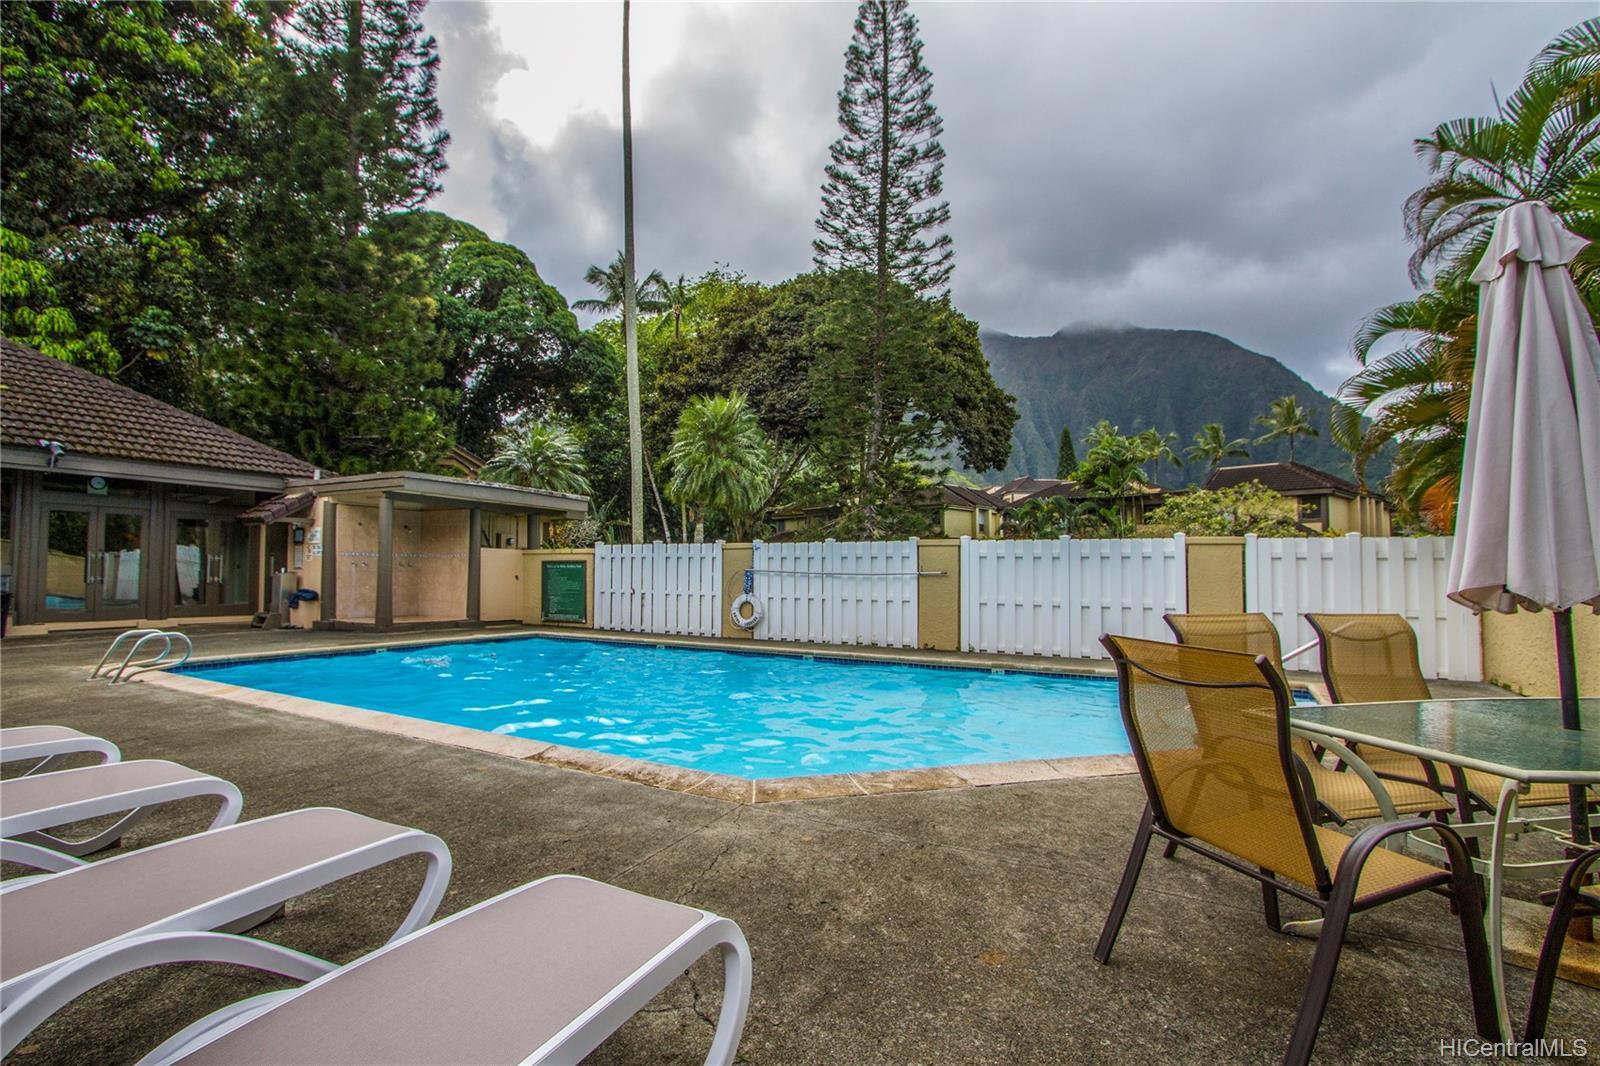 46-324 Haiku Road townhouse # 106, Kaneohe, Hawaii - photo 21 of 24